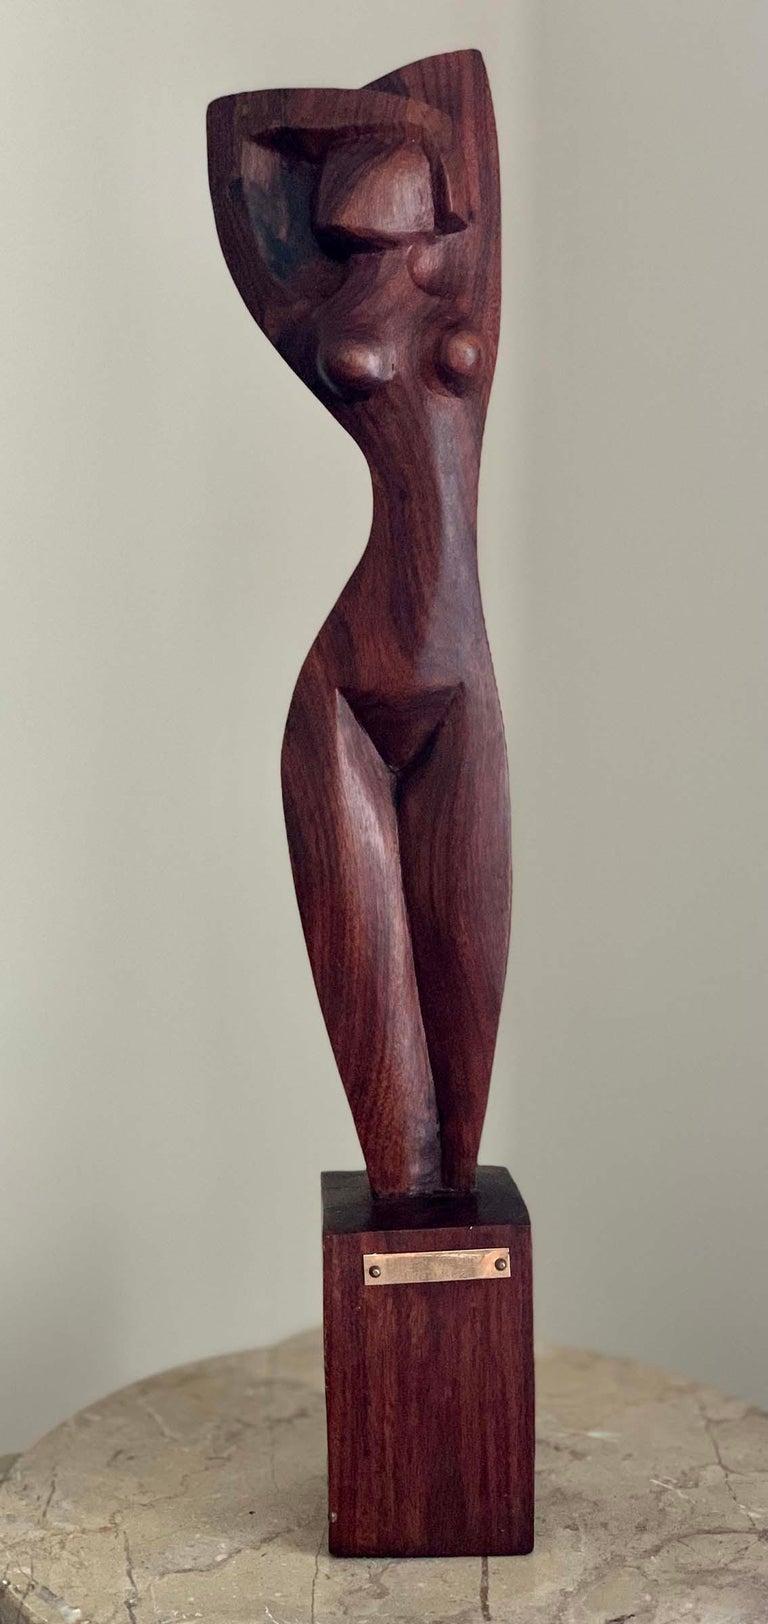 Ulises Jimenez Obregon Nude Sculpture - STANDING NUDE